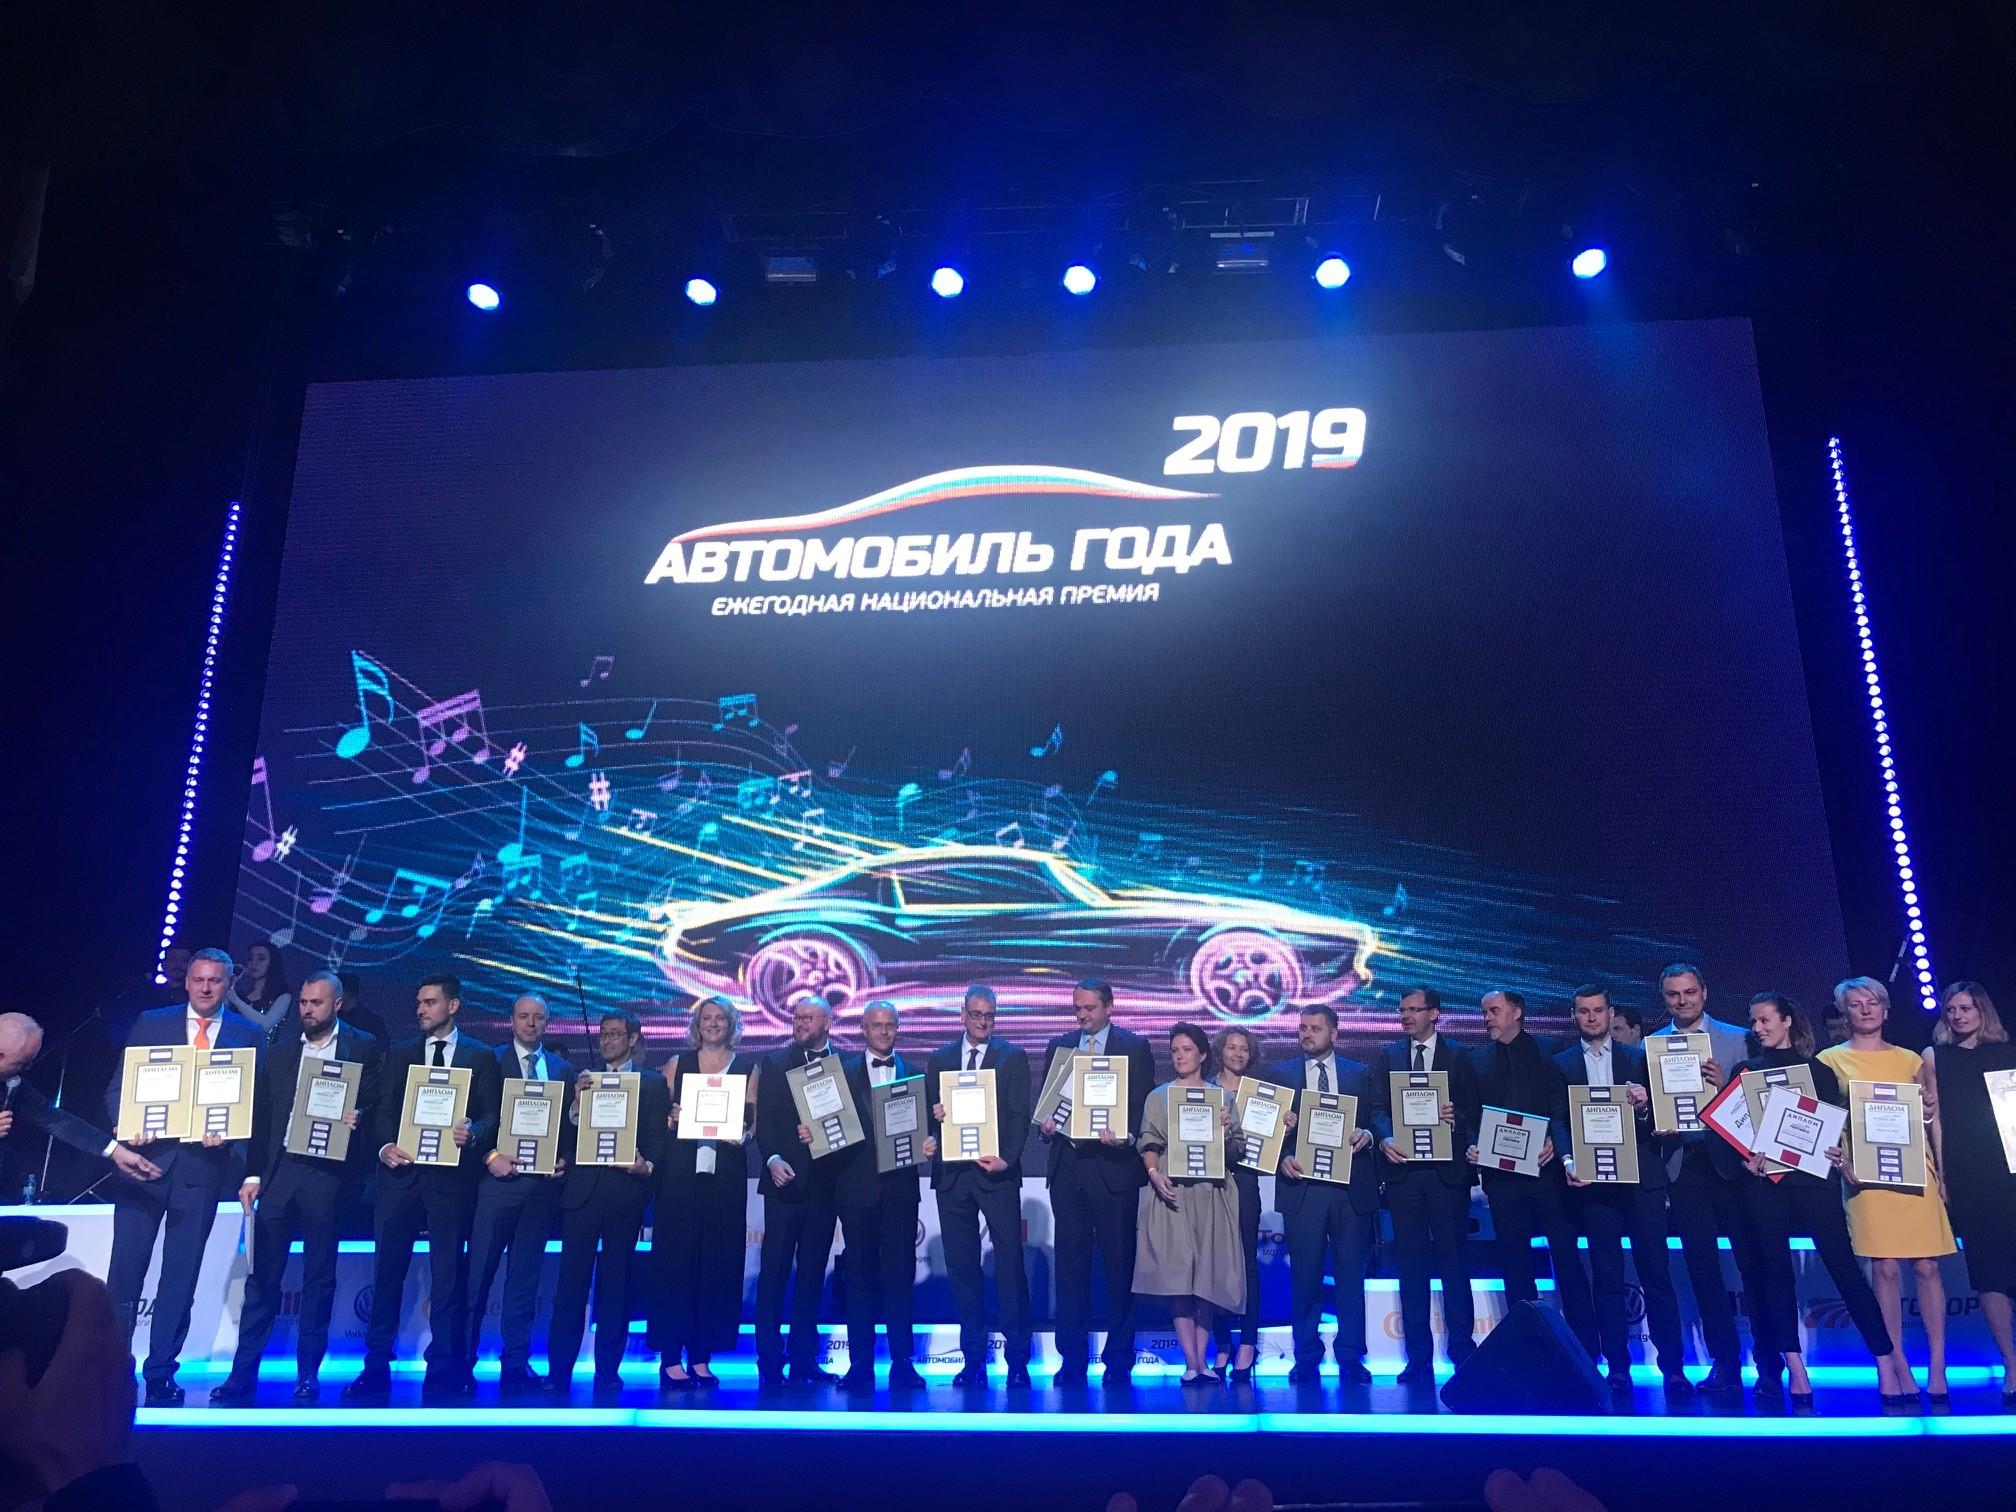 Autogoda 2019